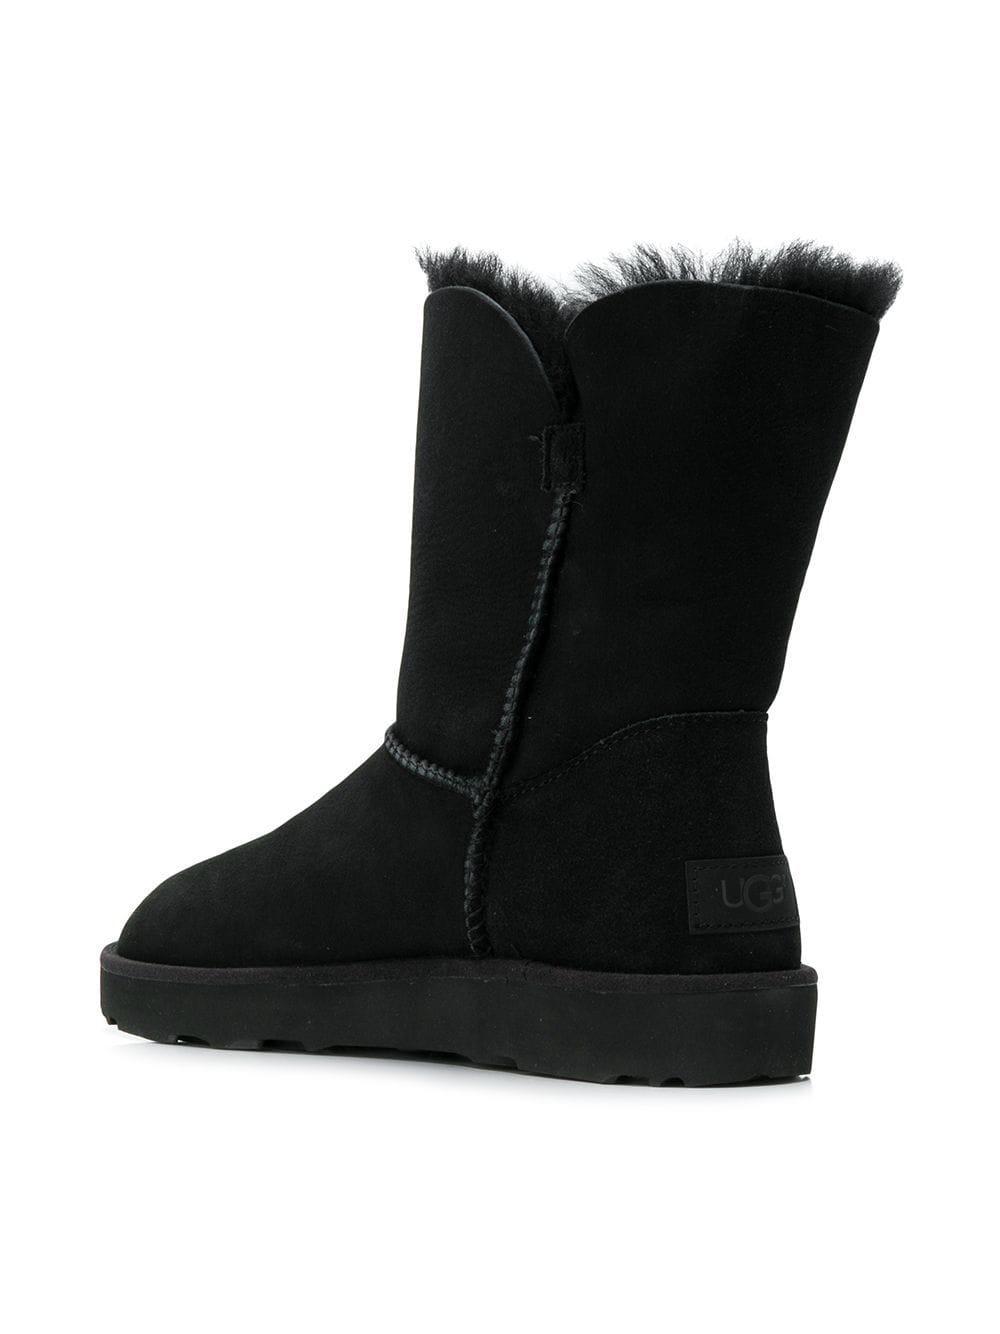 Ugg - Black Classic Cuff Short Boots - Lyst. View fullscreen